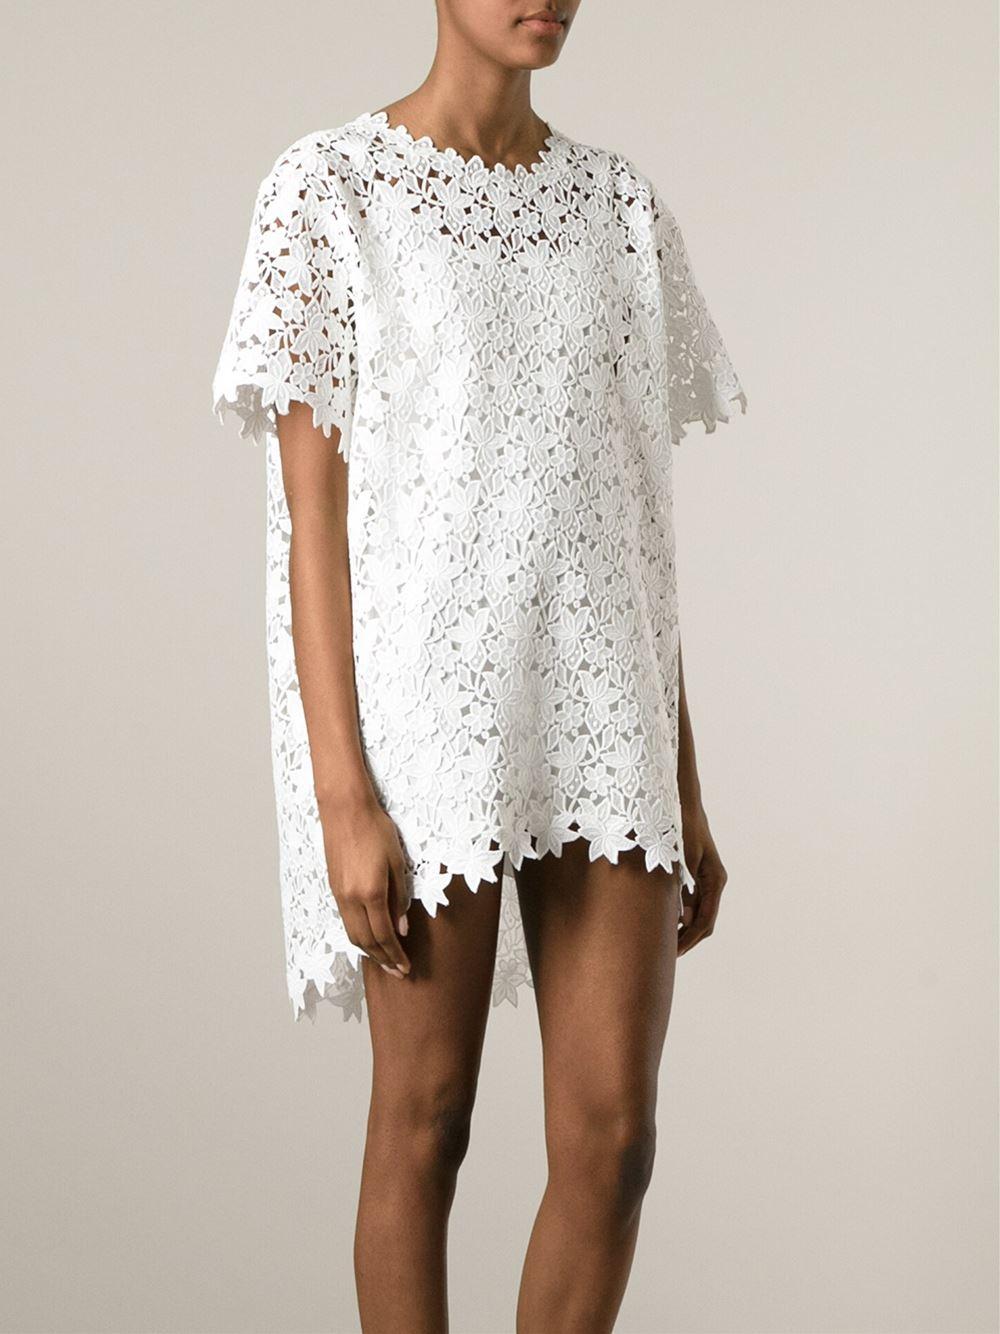 long lace detail dress - White Ermanno Scervino G23l4pyga